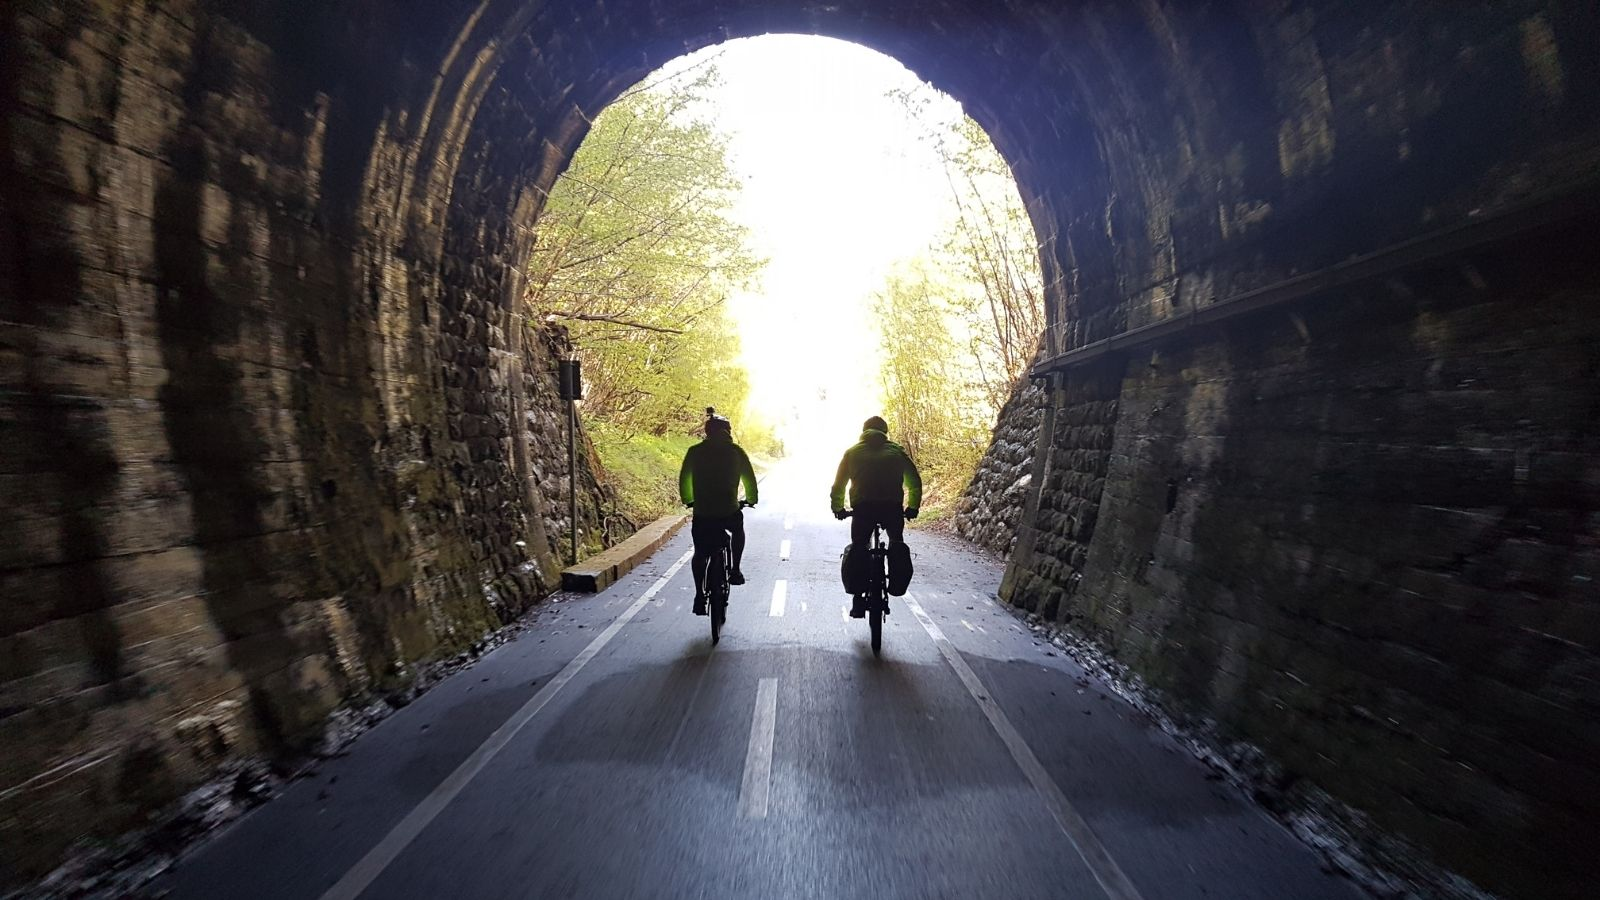 ciclovia alpe adria tunnel